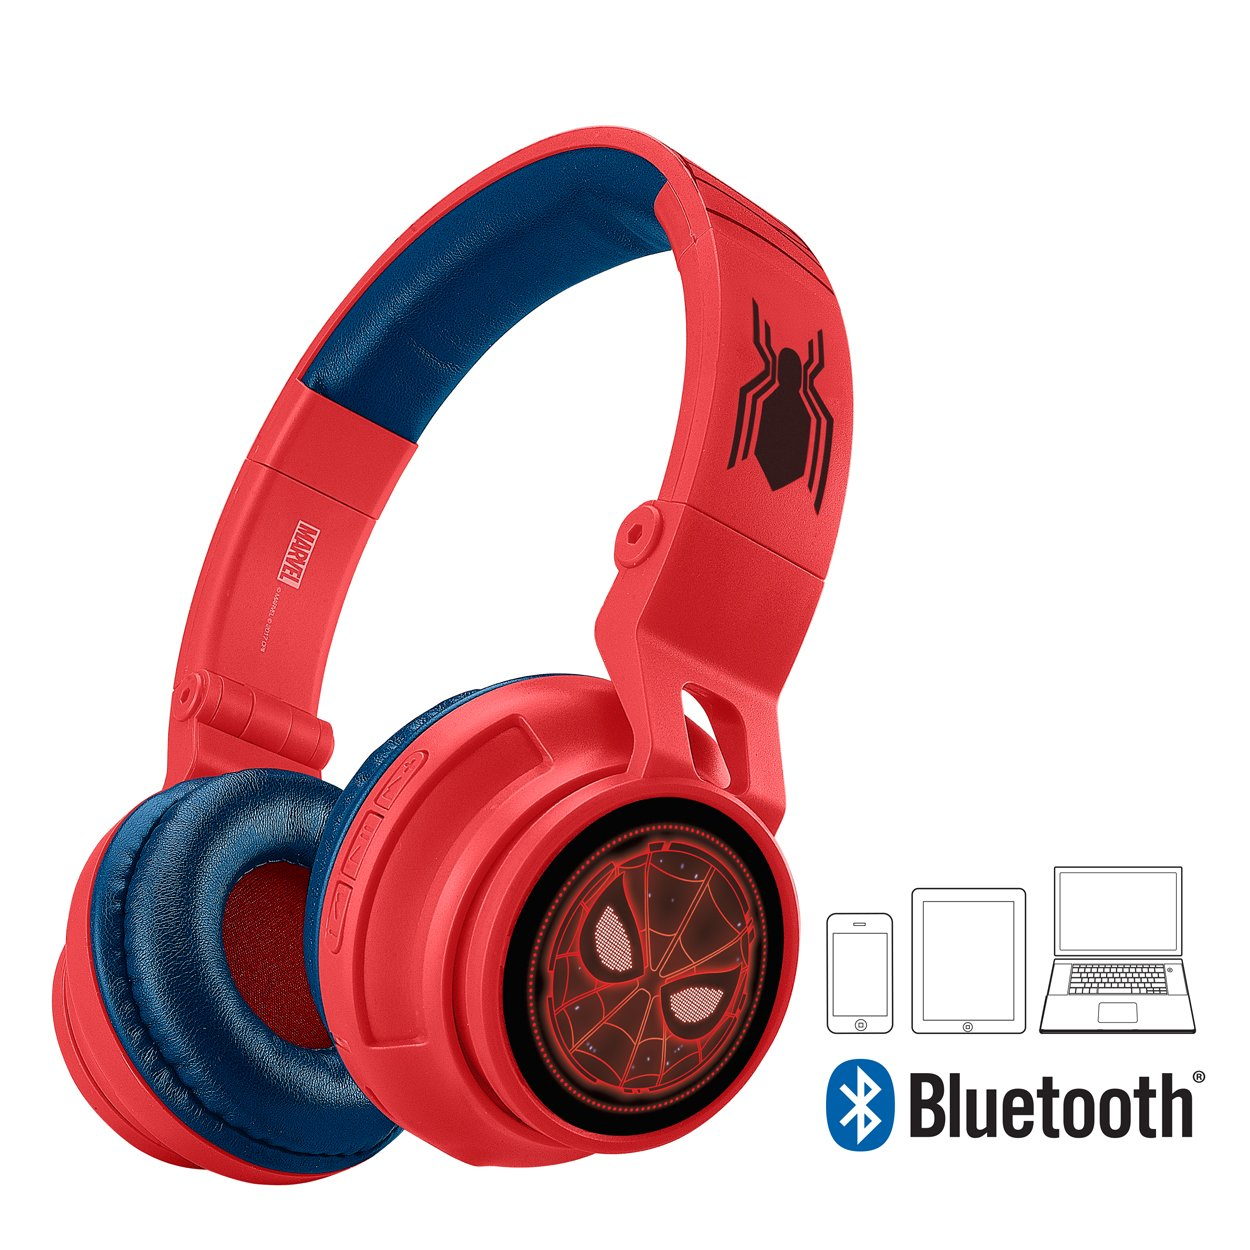 Spiderman Bluetooth Headphones for Kids Wireless Rechargeable Kid Friendly Sound (Spiderman)